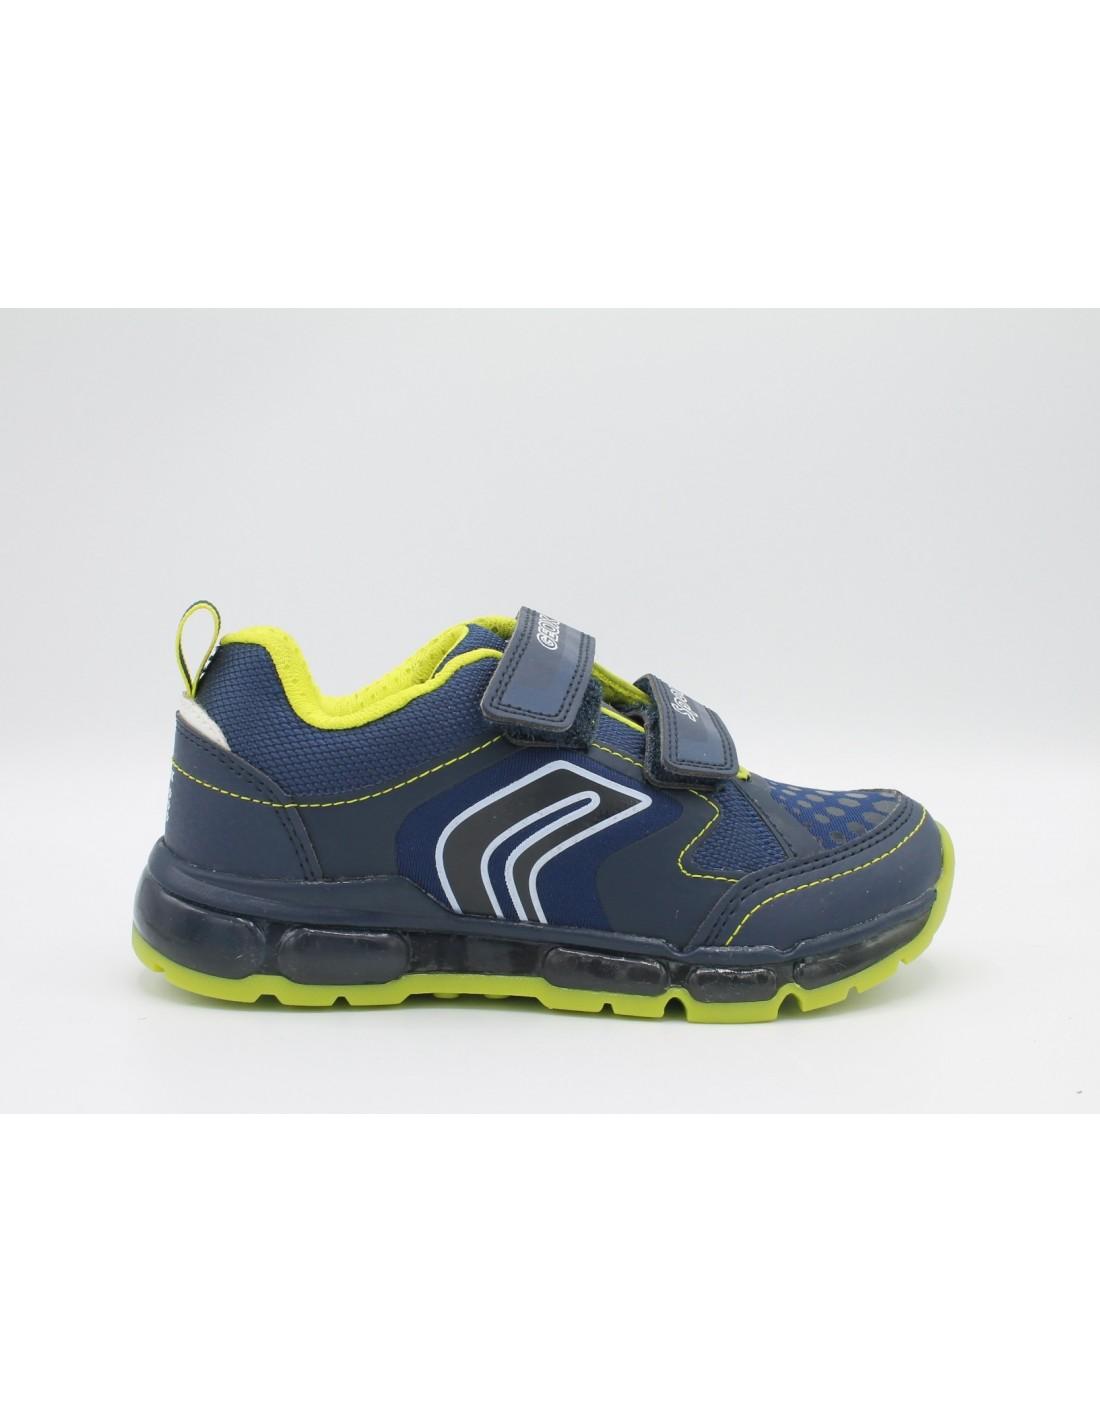 geox-scarpa-da-bambino-ragazzo-con-luci-android-j8444a-blu.jpg